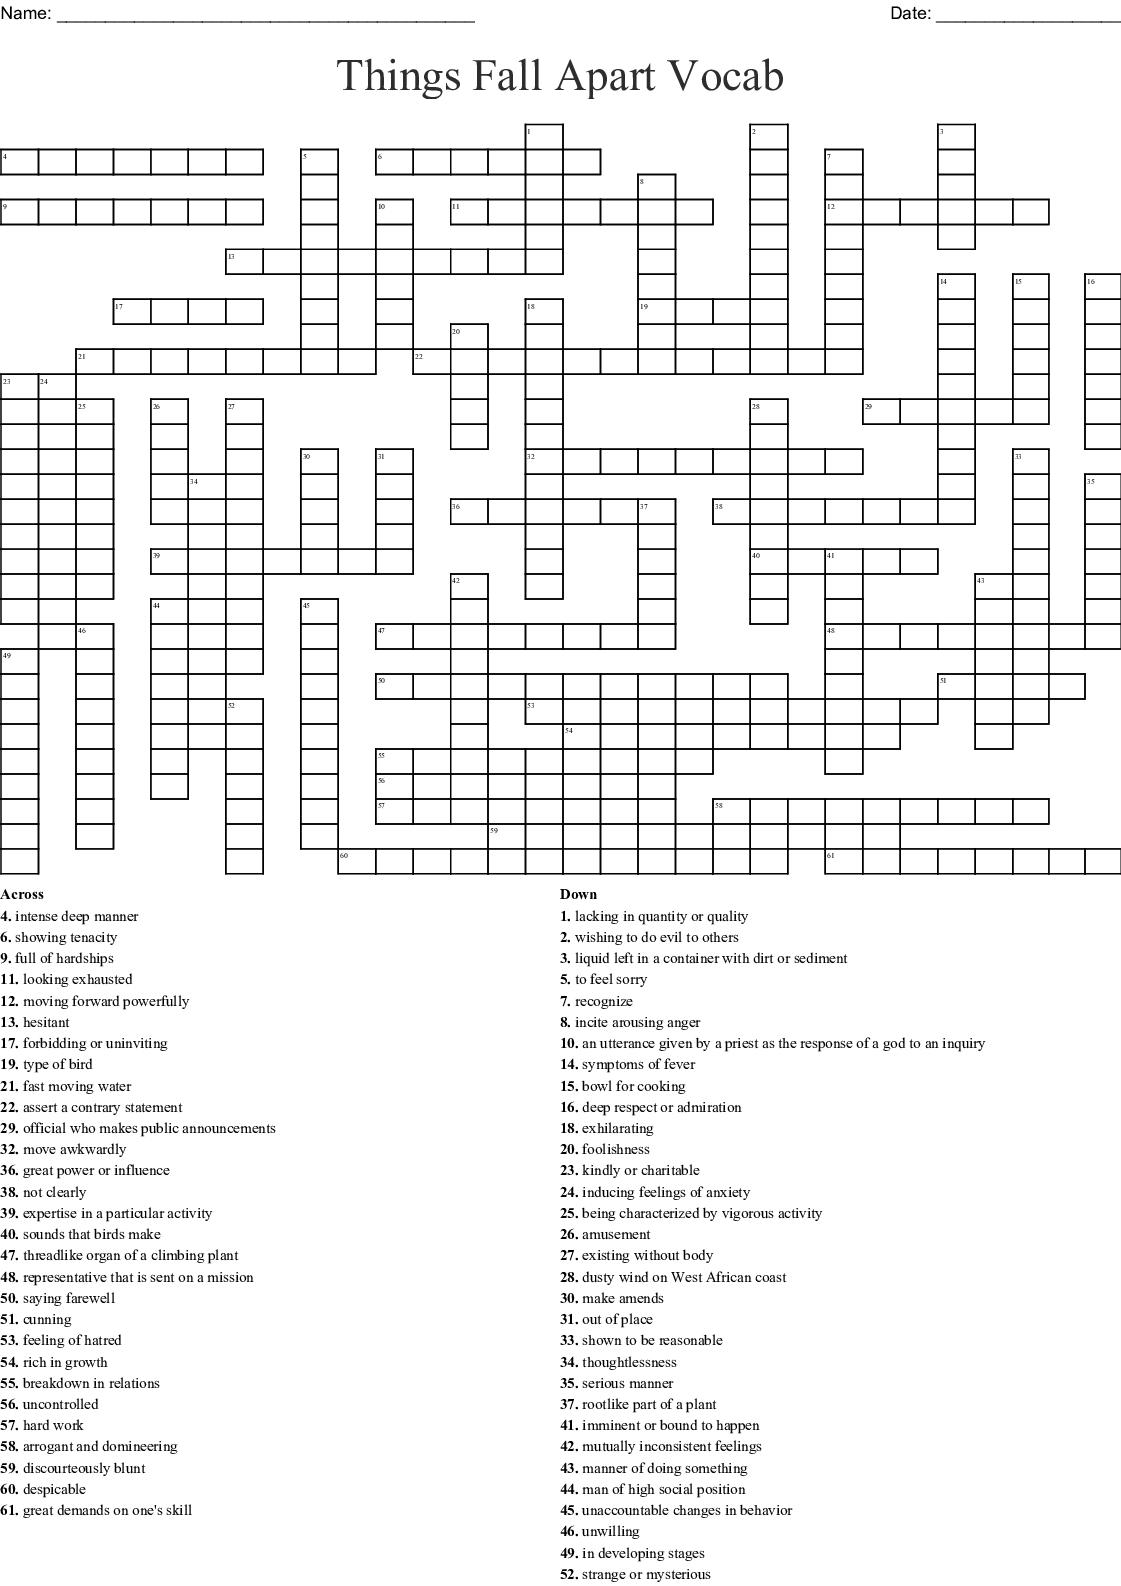 Things Fall Apart Vocabulary Crossword